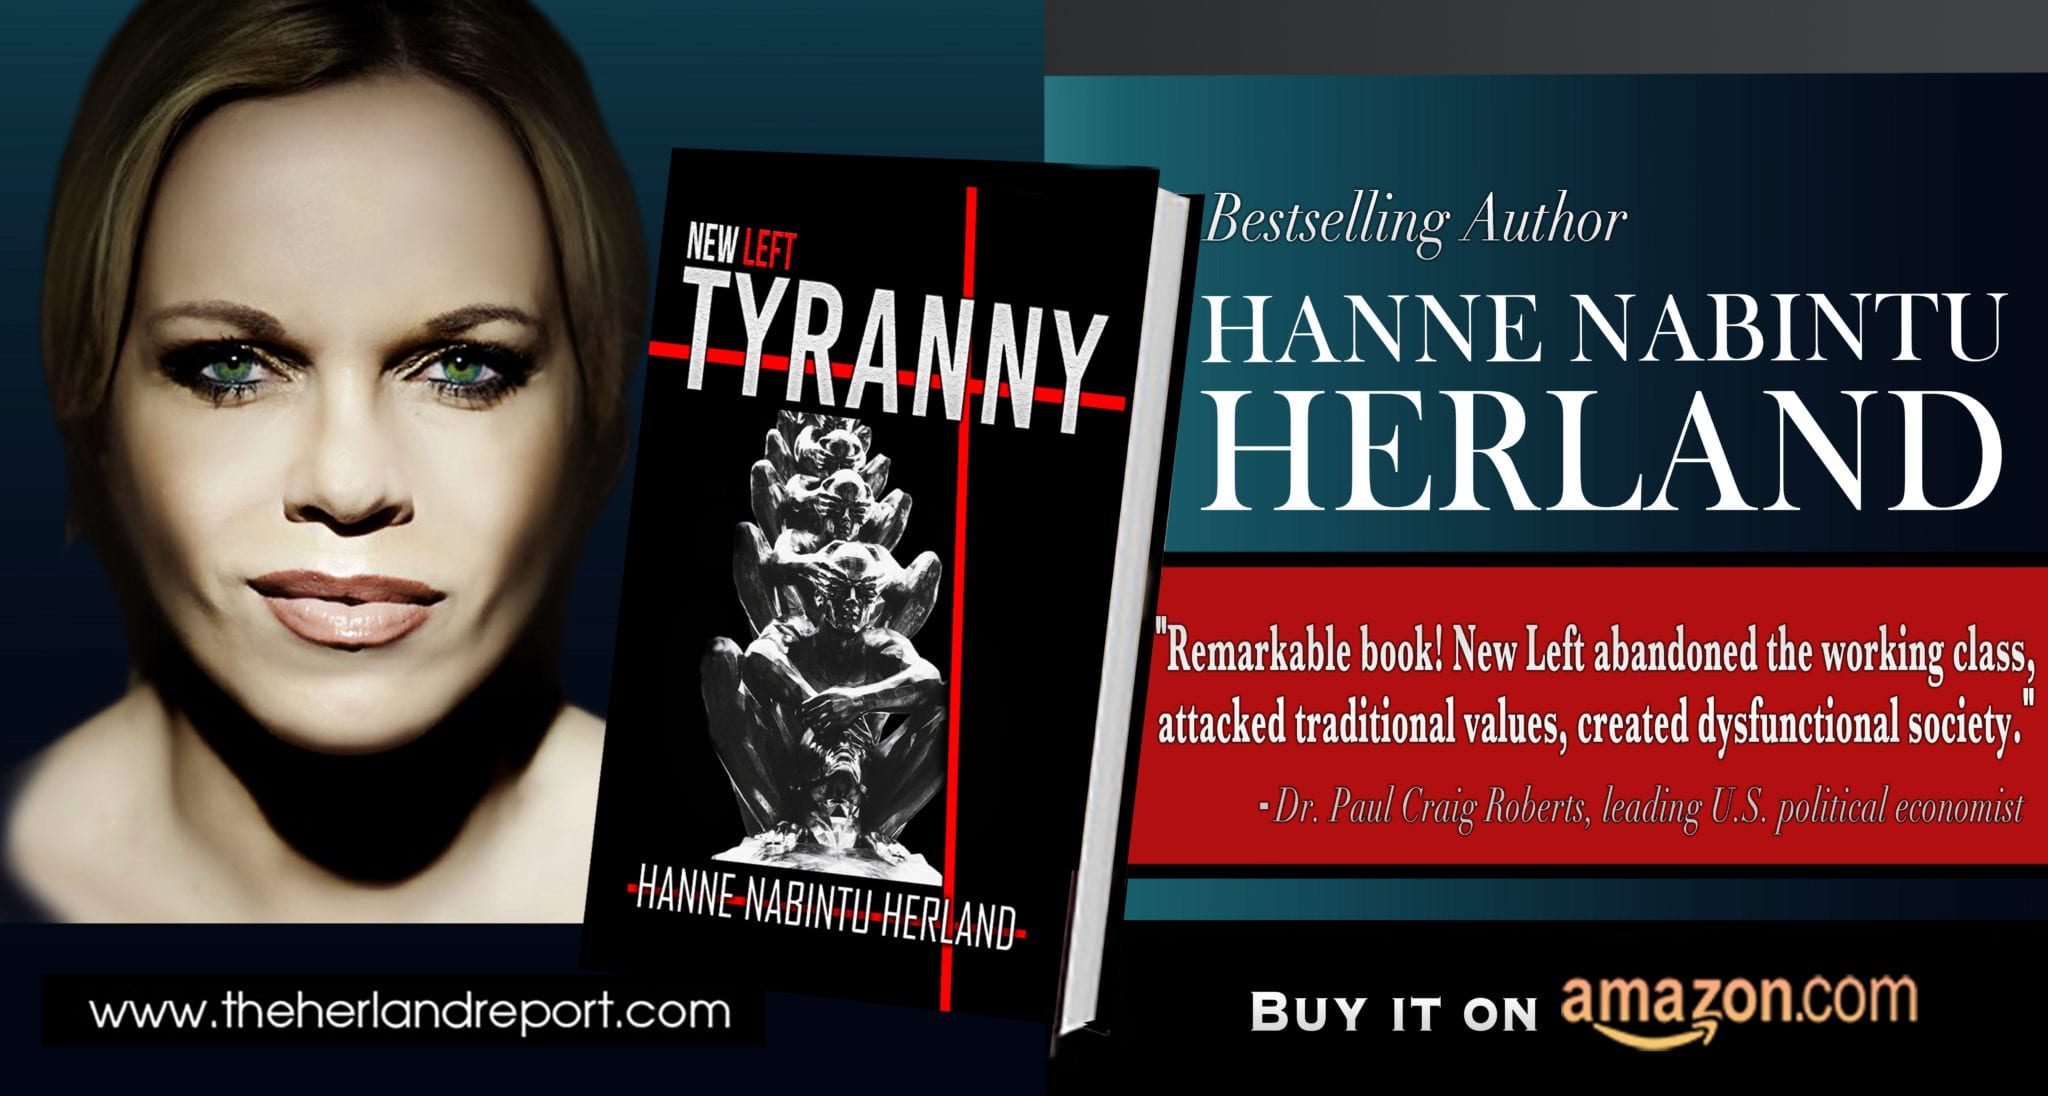 New Left Tyranny, by bestselling author Hanne Nabintu Herland